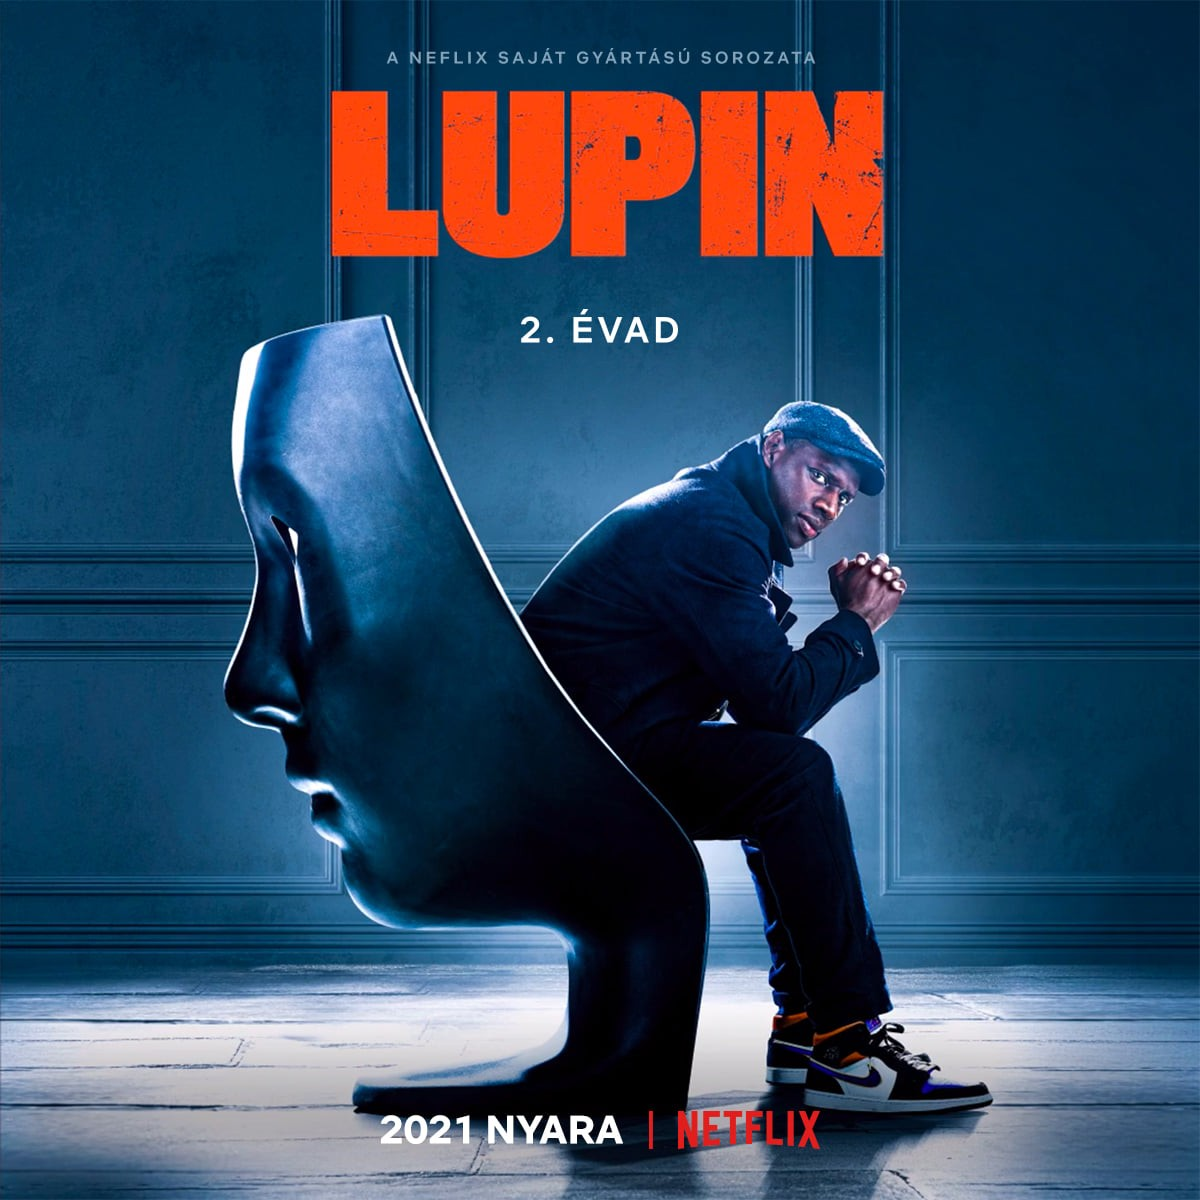 lupin második évad